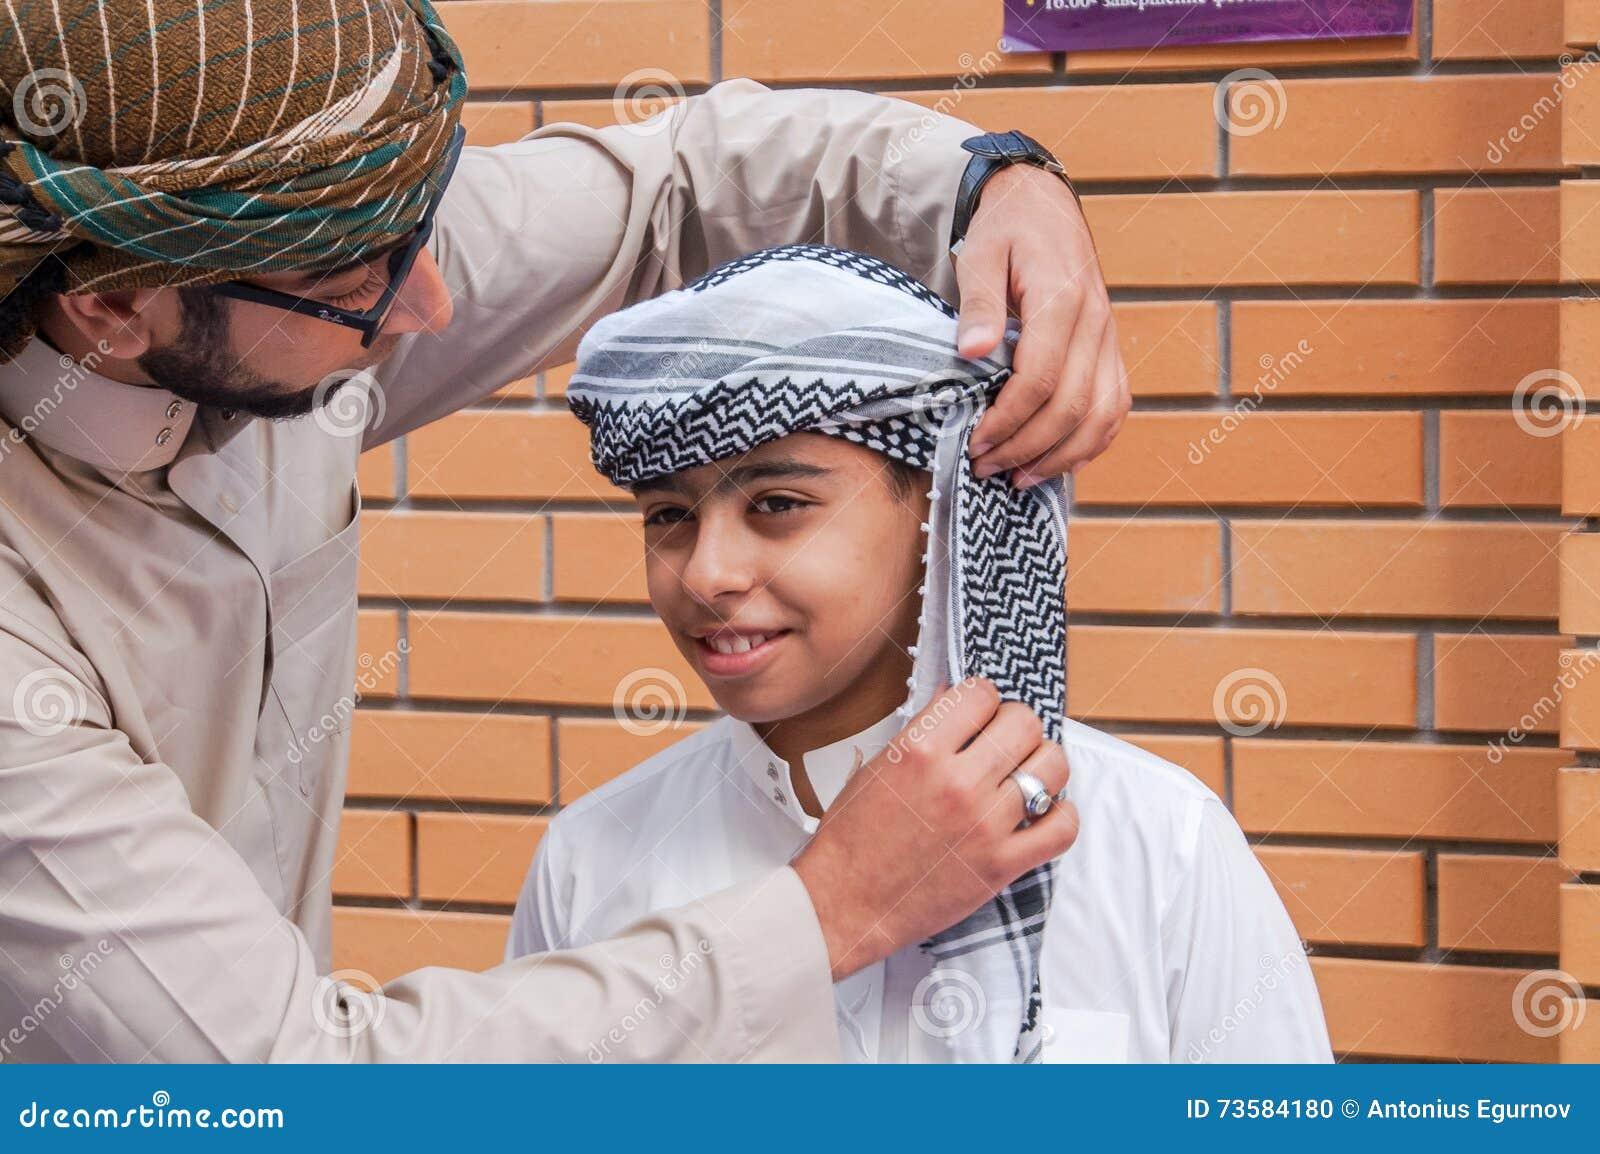 Sls spanish arabian headdress with bitsugars legacy stables classic